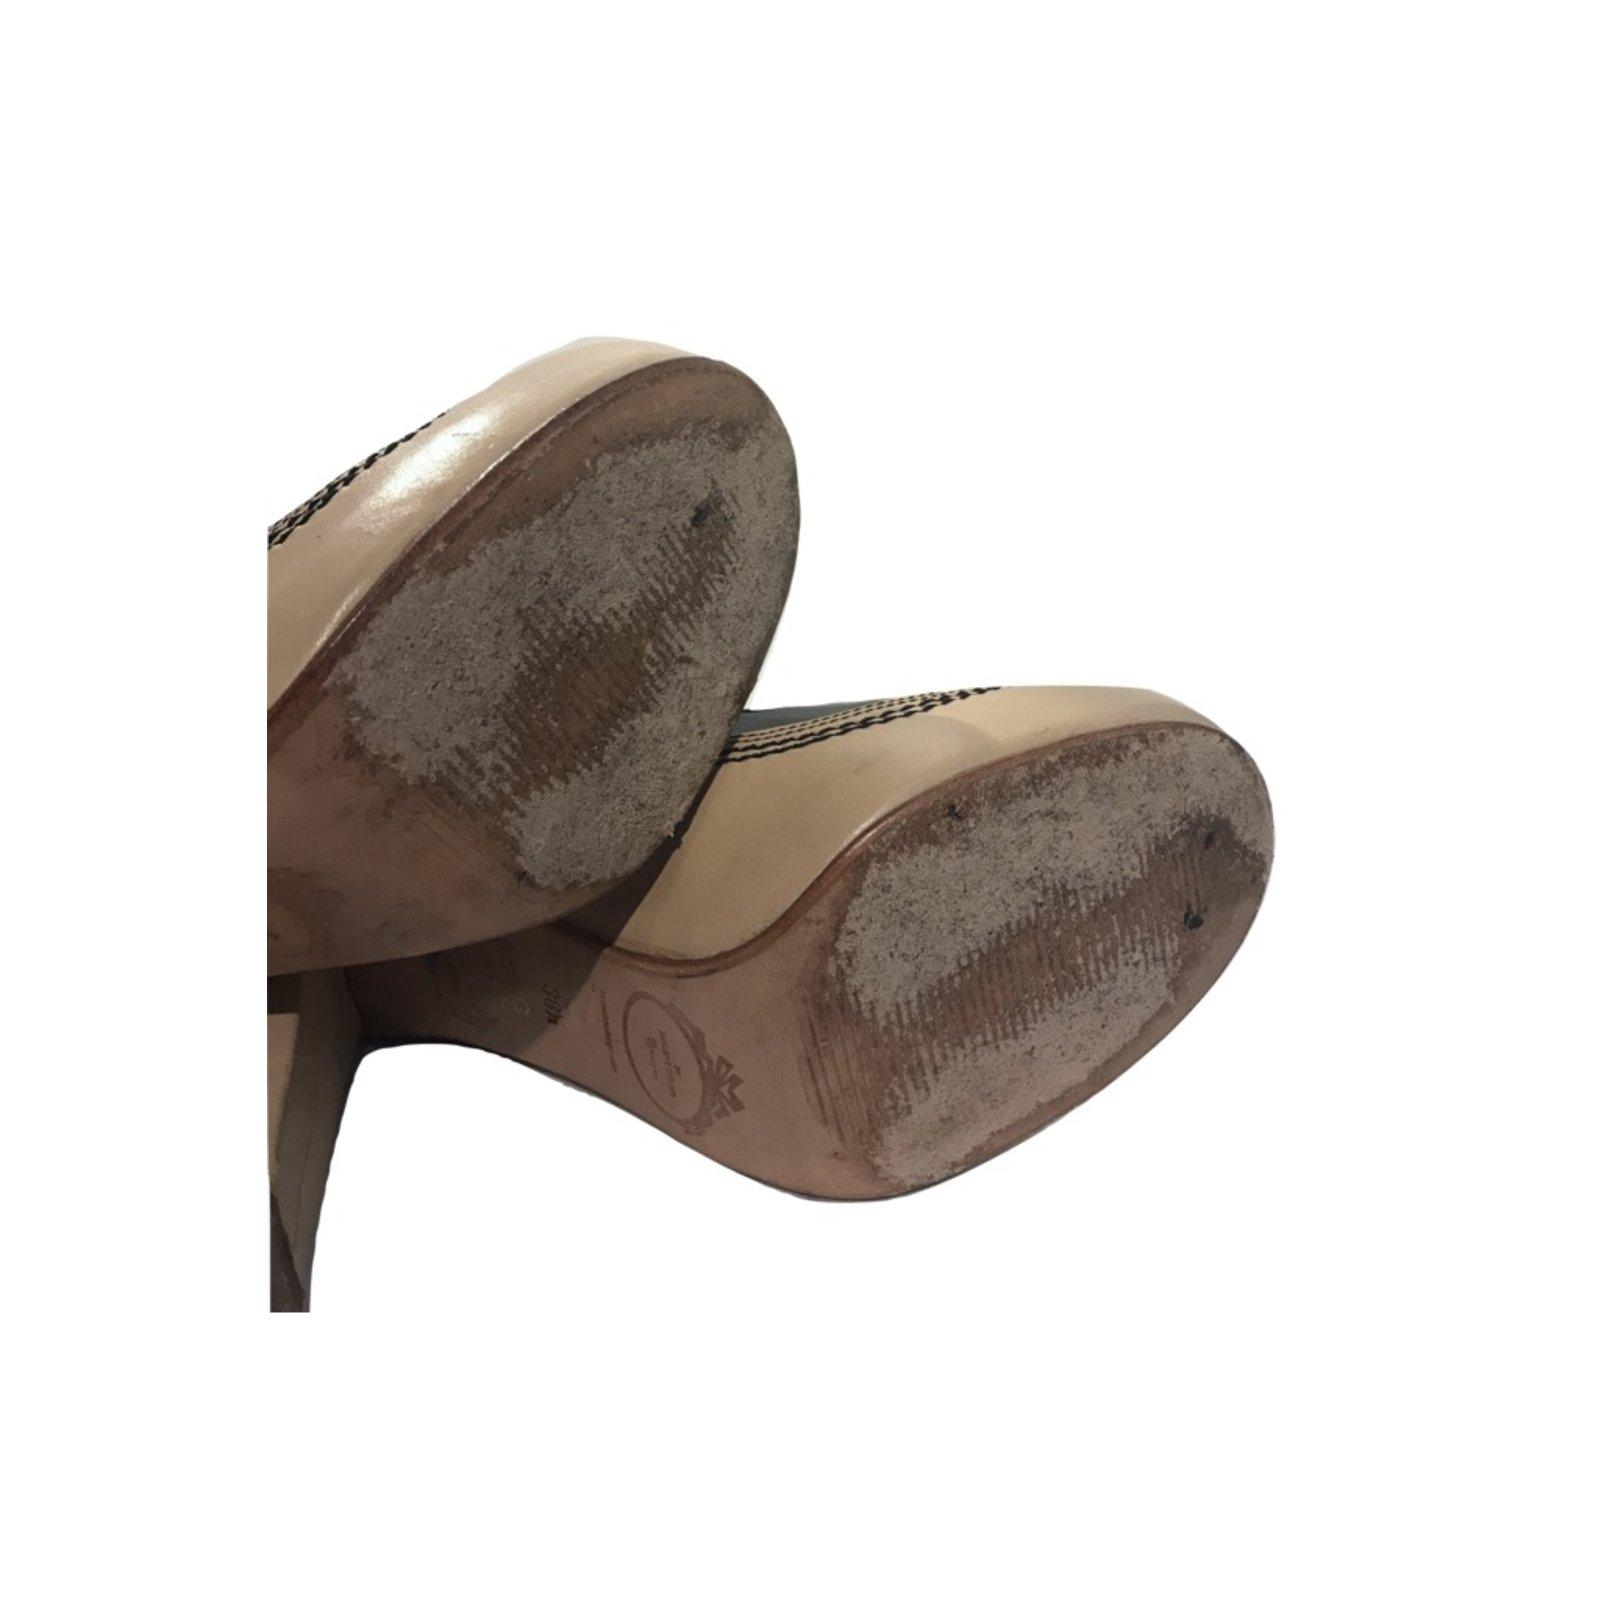 e4e2ca91c92 By Malene Birger Heels Heels Patent leather Cream ref.58840 - Joli Closet